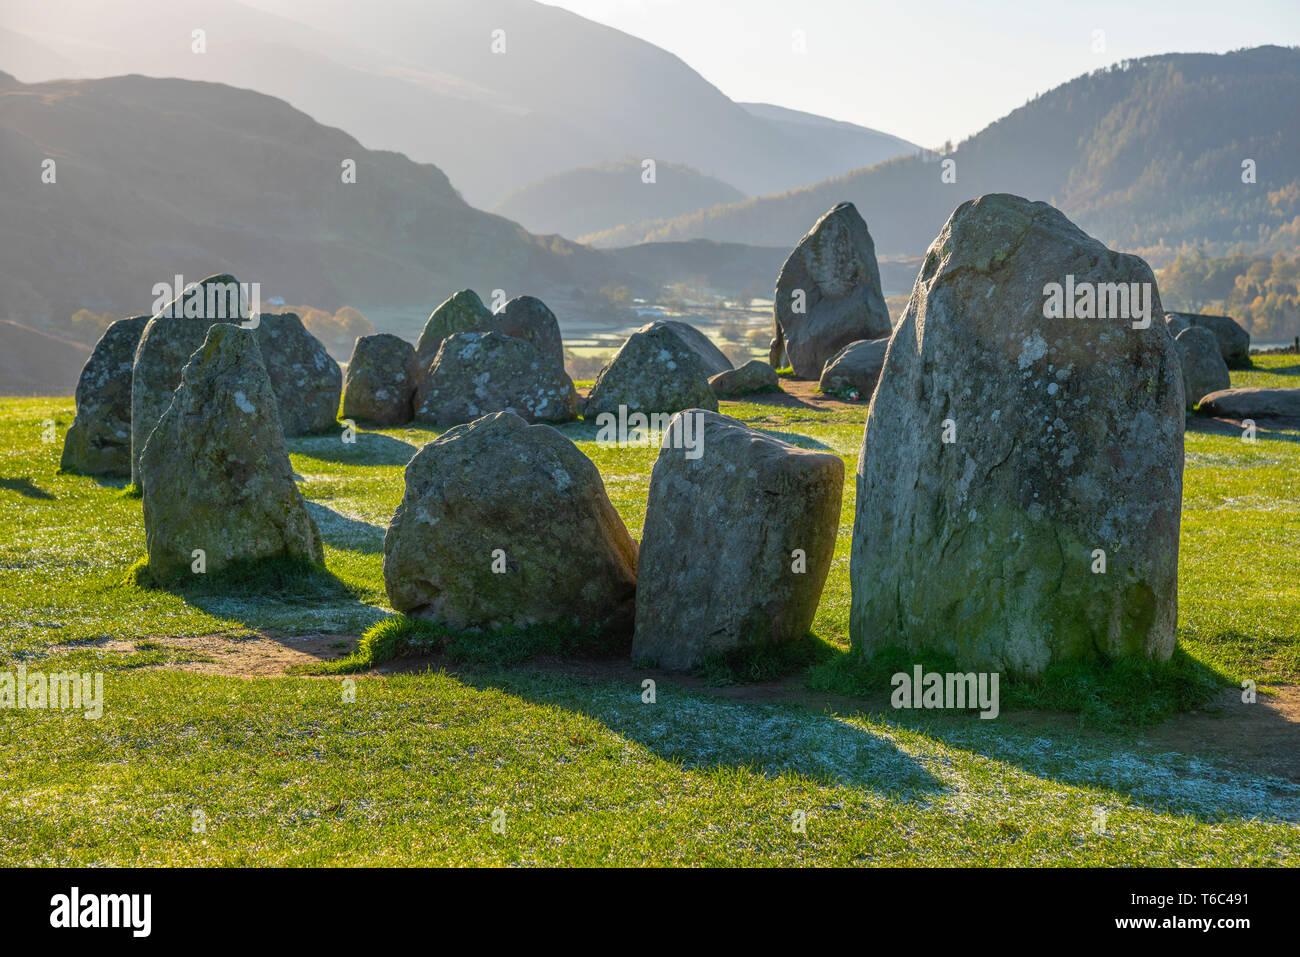 UK, Cumbria, Lake District, Castlerigg Stone Circle Stock Photo